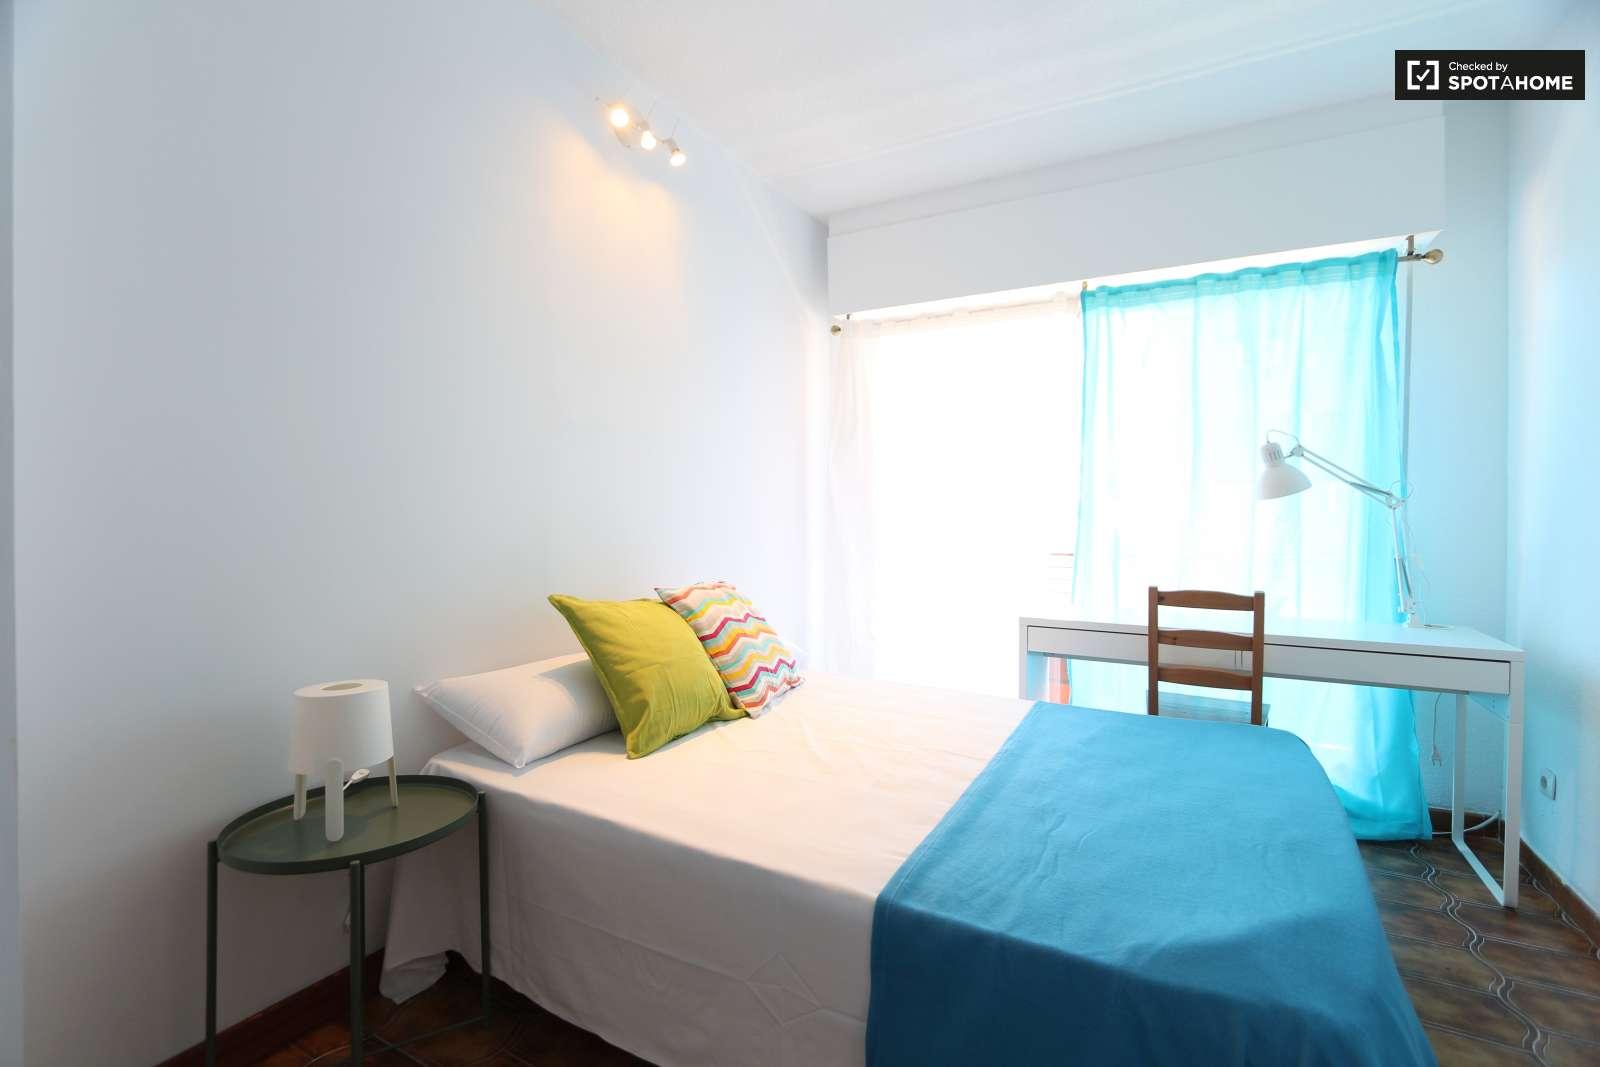 Room with balcony 5 bedroom apartment in puente de for Five bedroom apartments